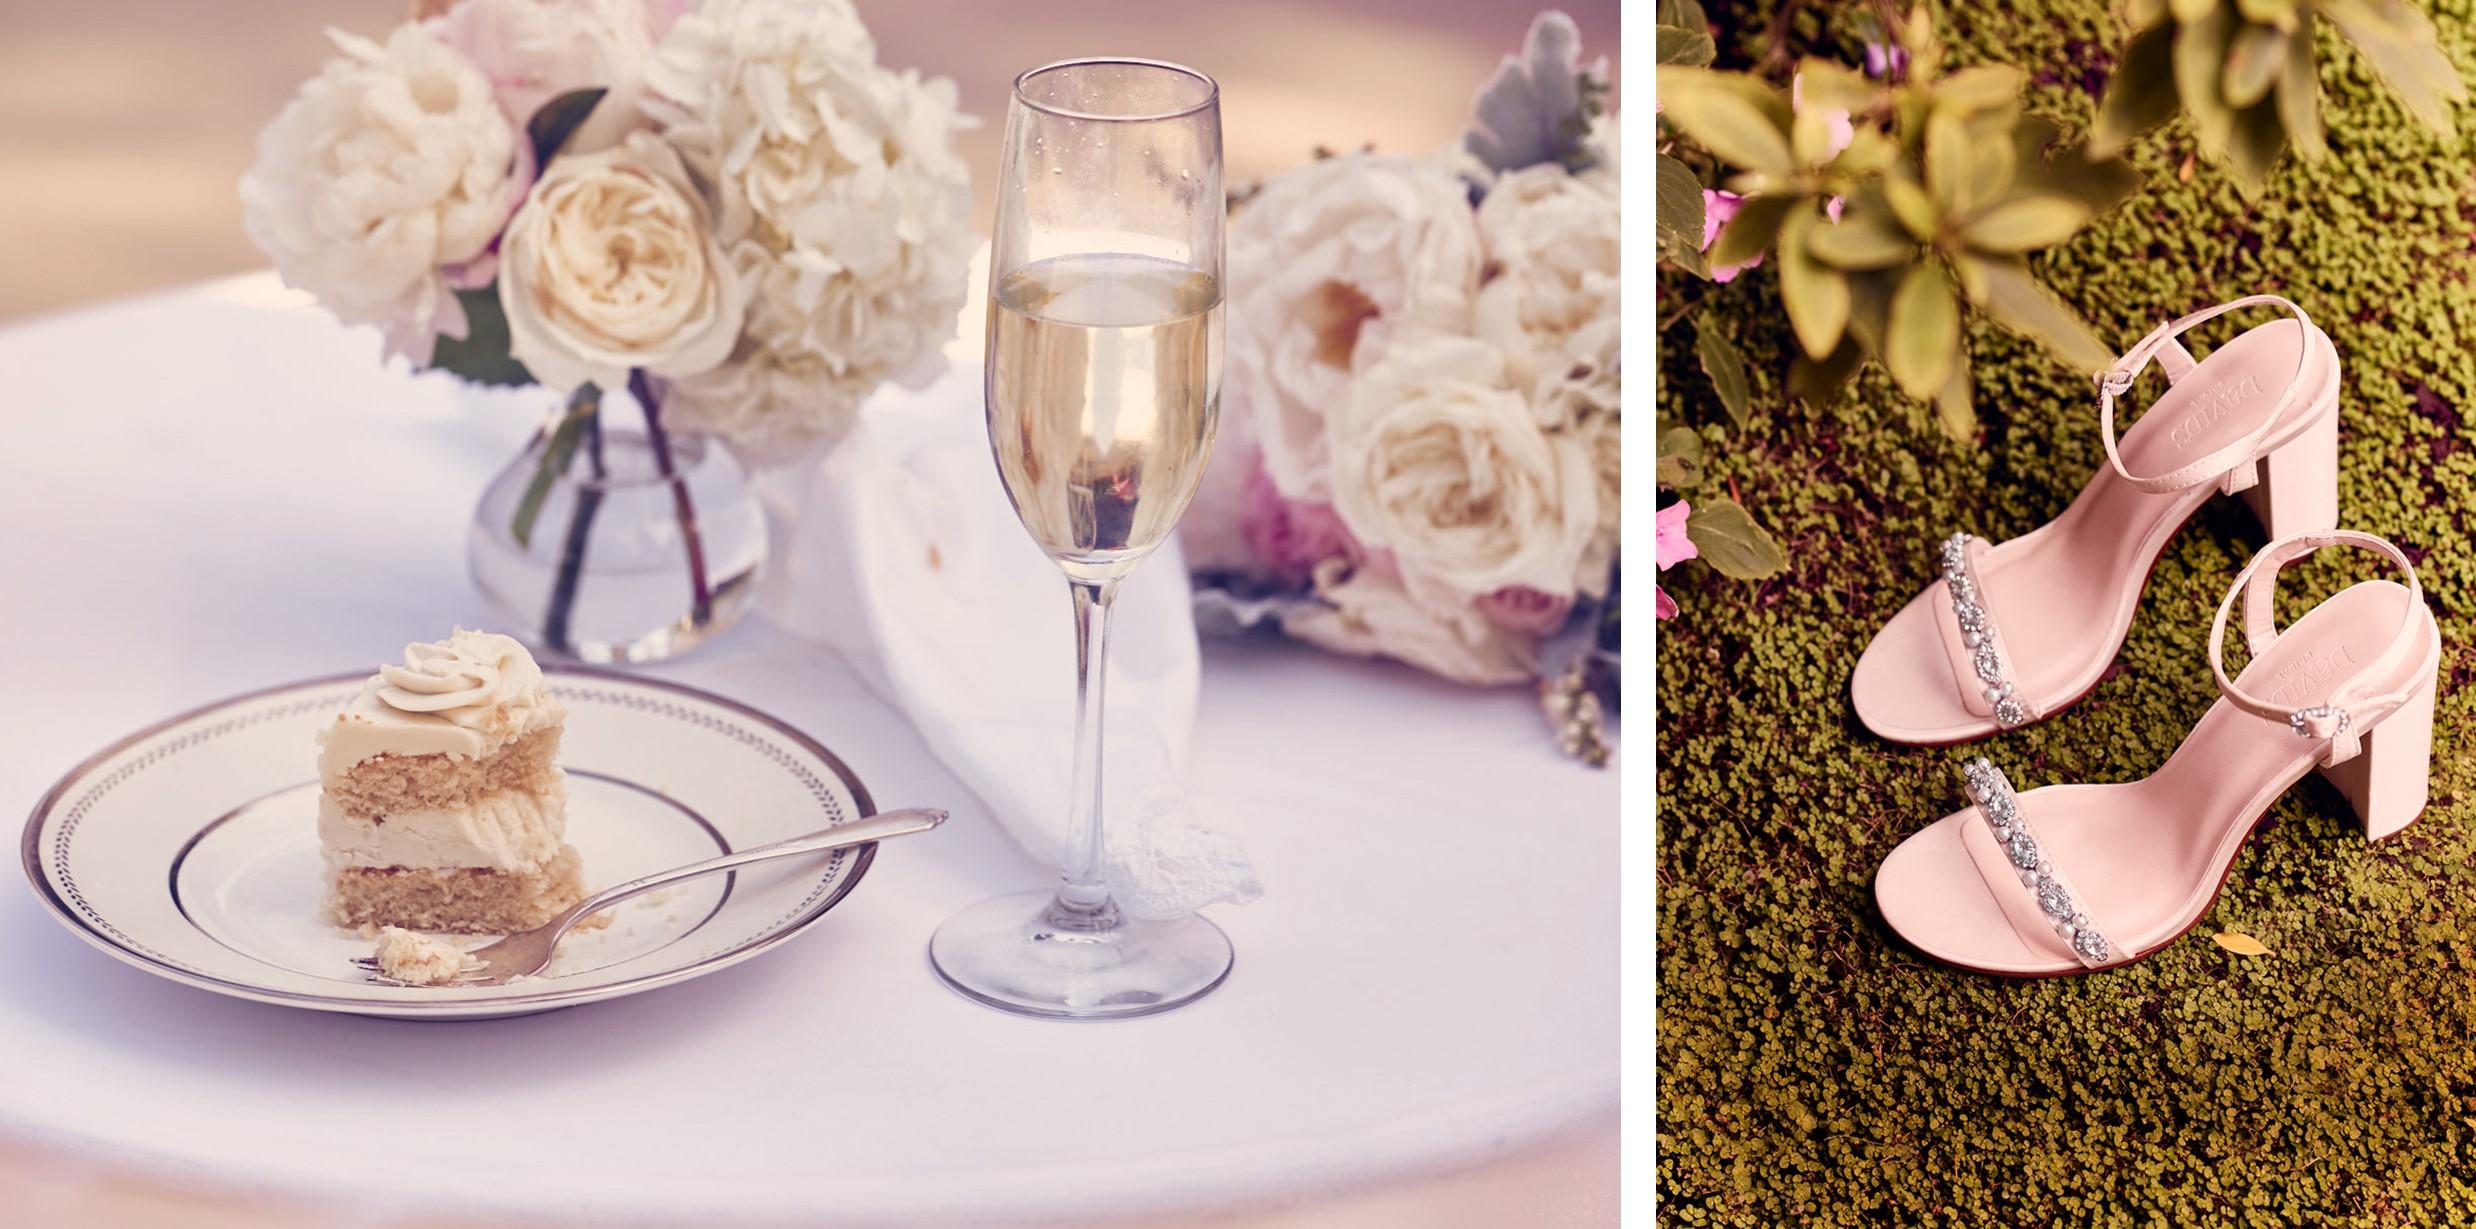 Backyard Wedding Inspiration from David's Bridal Collection